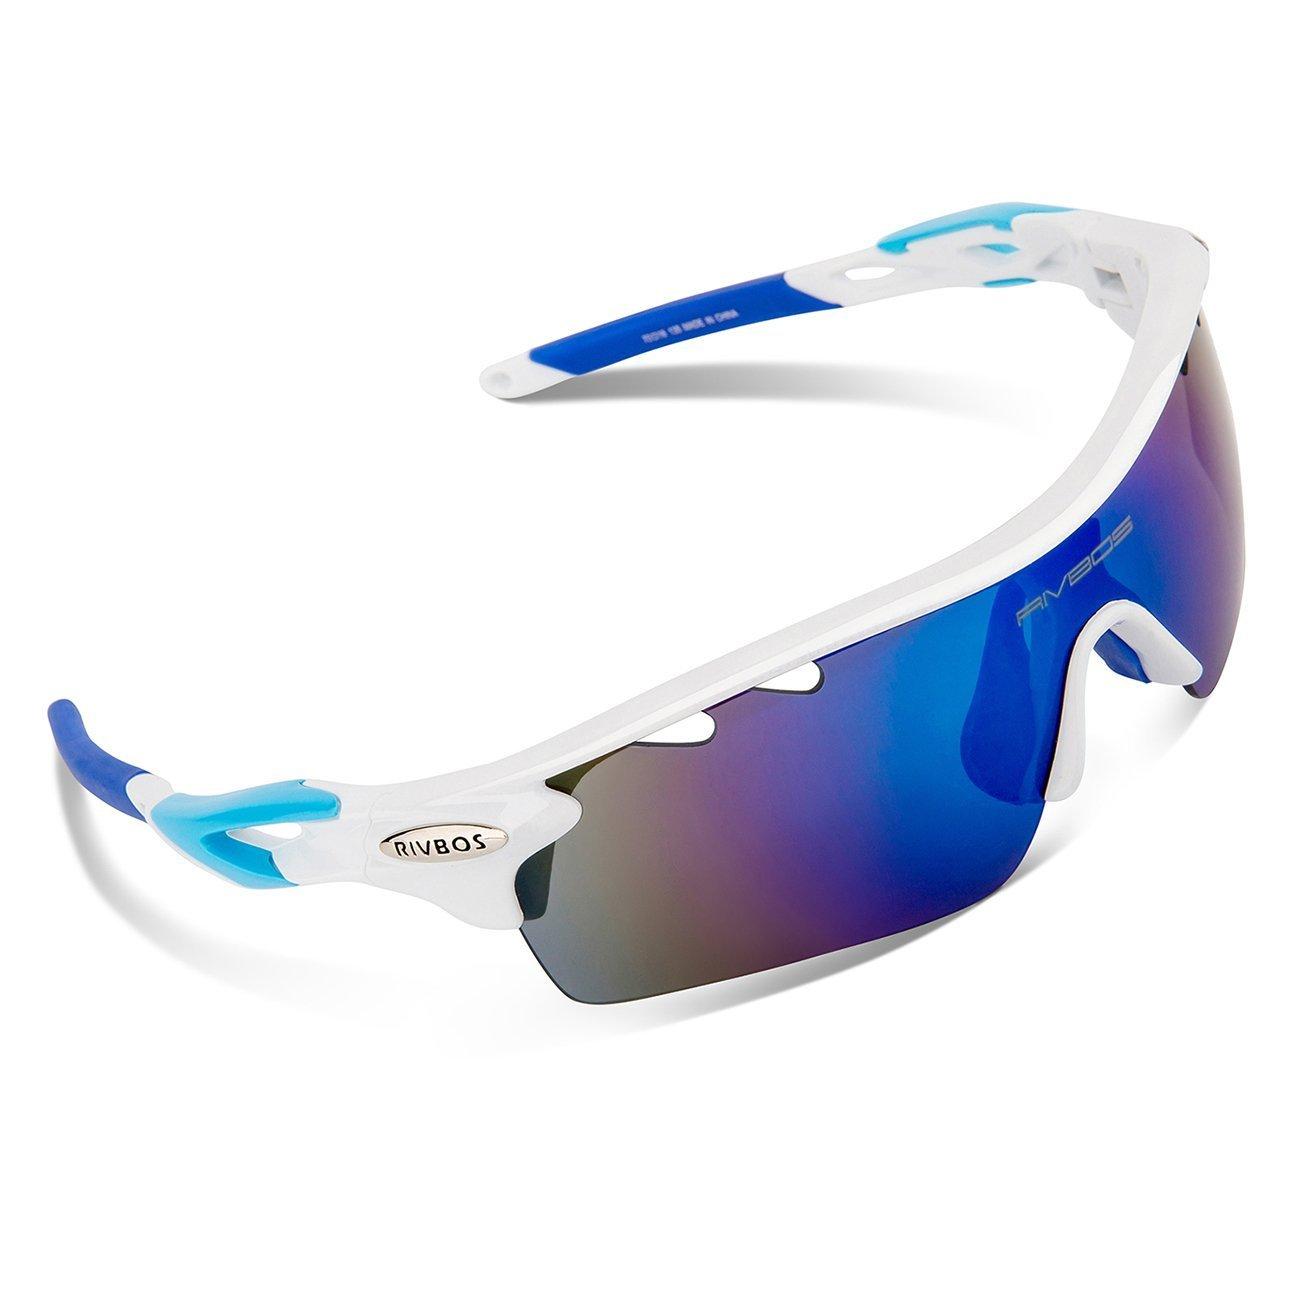 Rivbos 801 Polarized Sports Sunglasses $12.99-$16.89AC